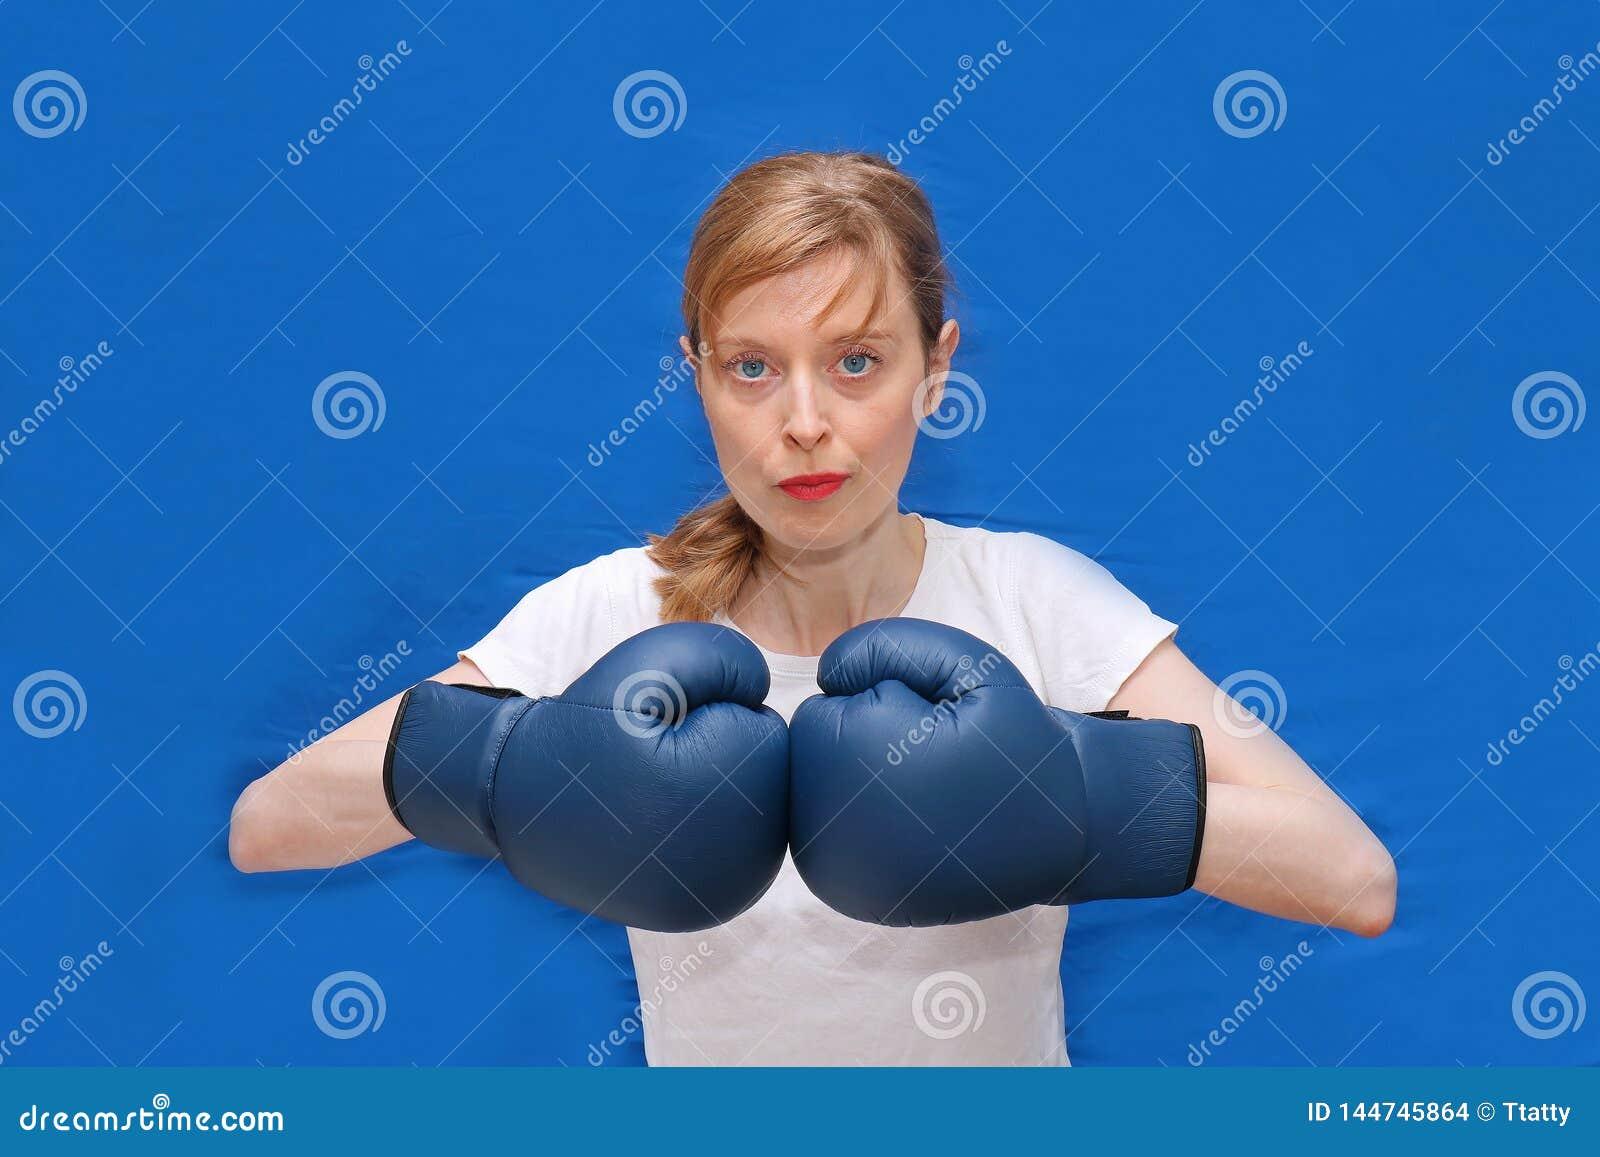 Girl boxer in blue arena